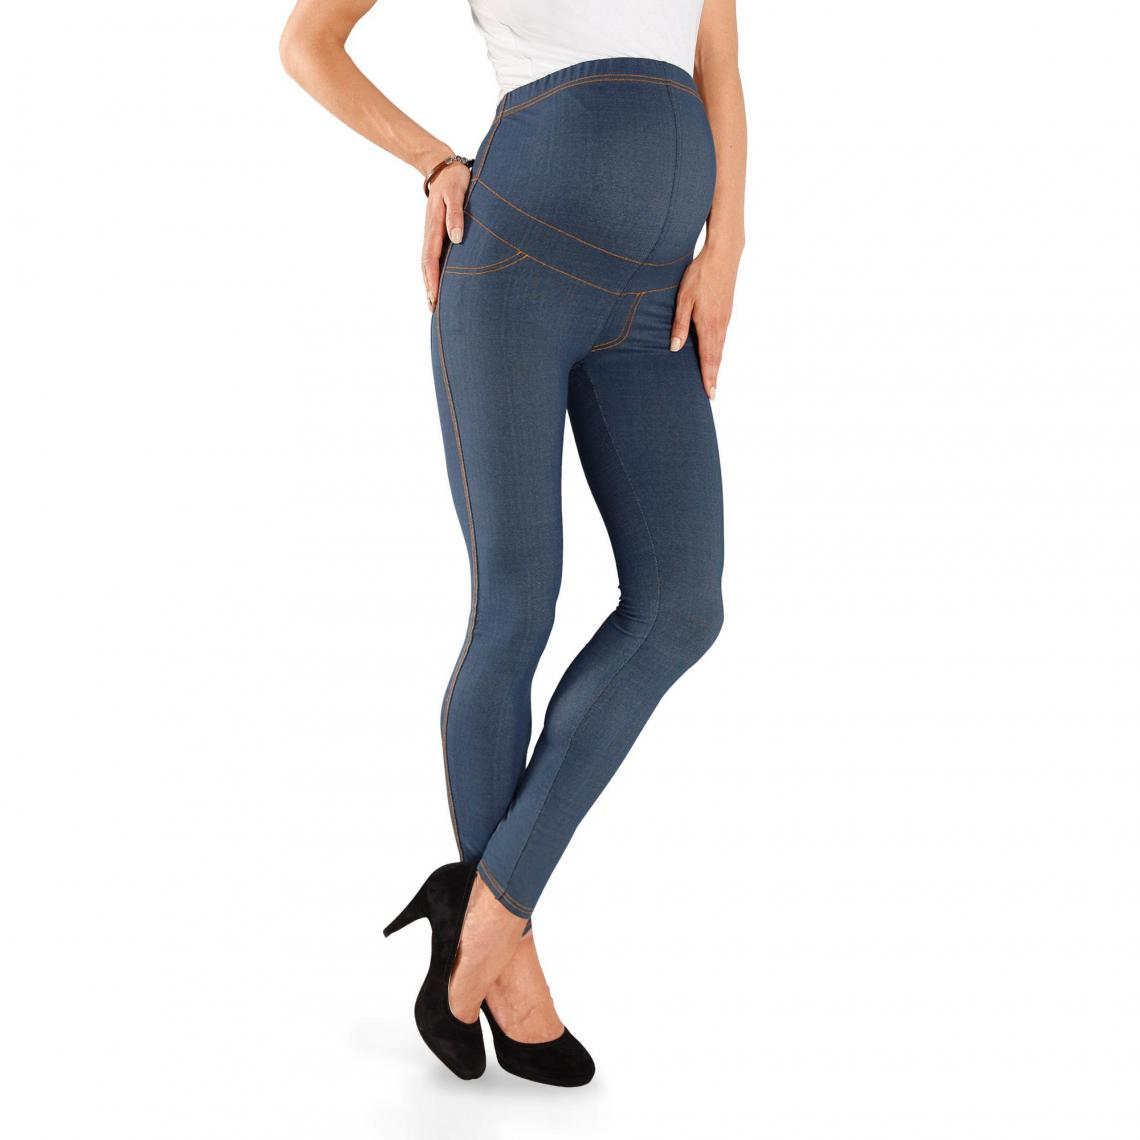 5ab4b98089a9c Legging de grossesse façon jean 9 Monate - Blue Denim Neun Monate Femme